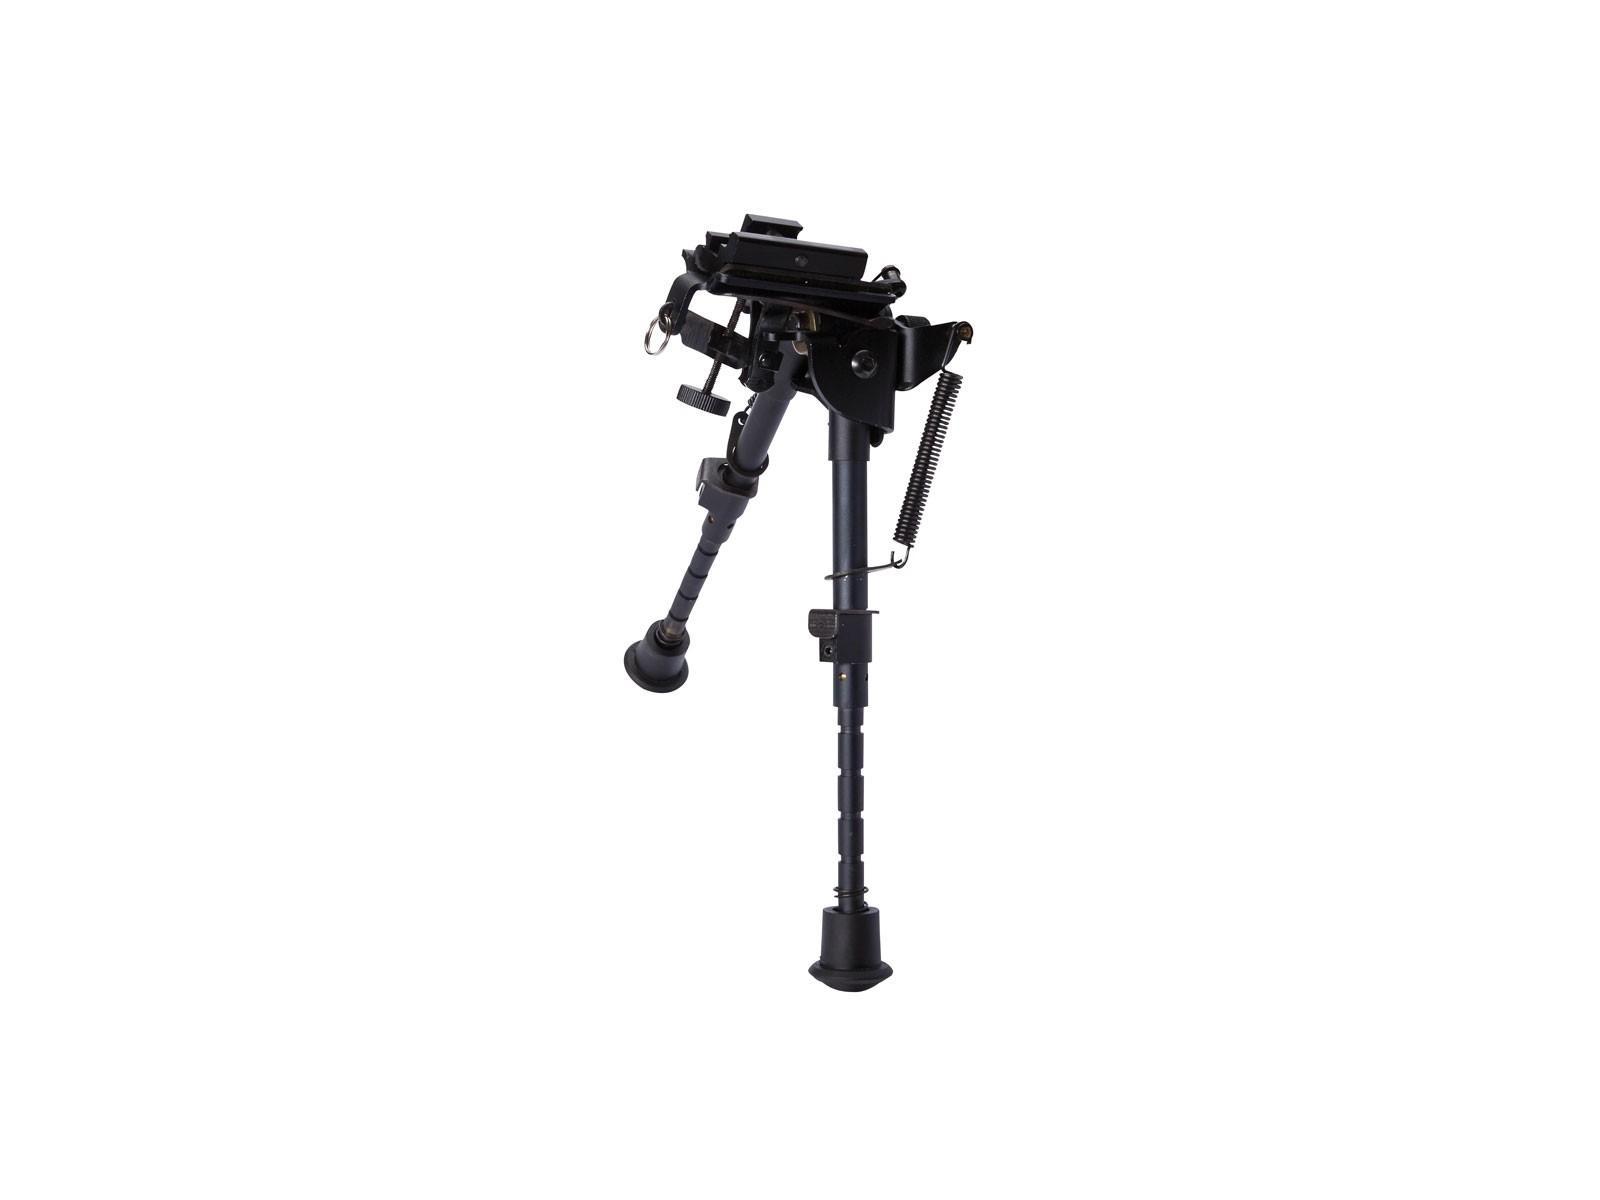 ASG Universal Bipod